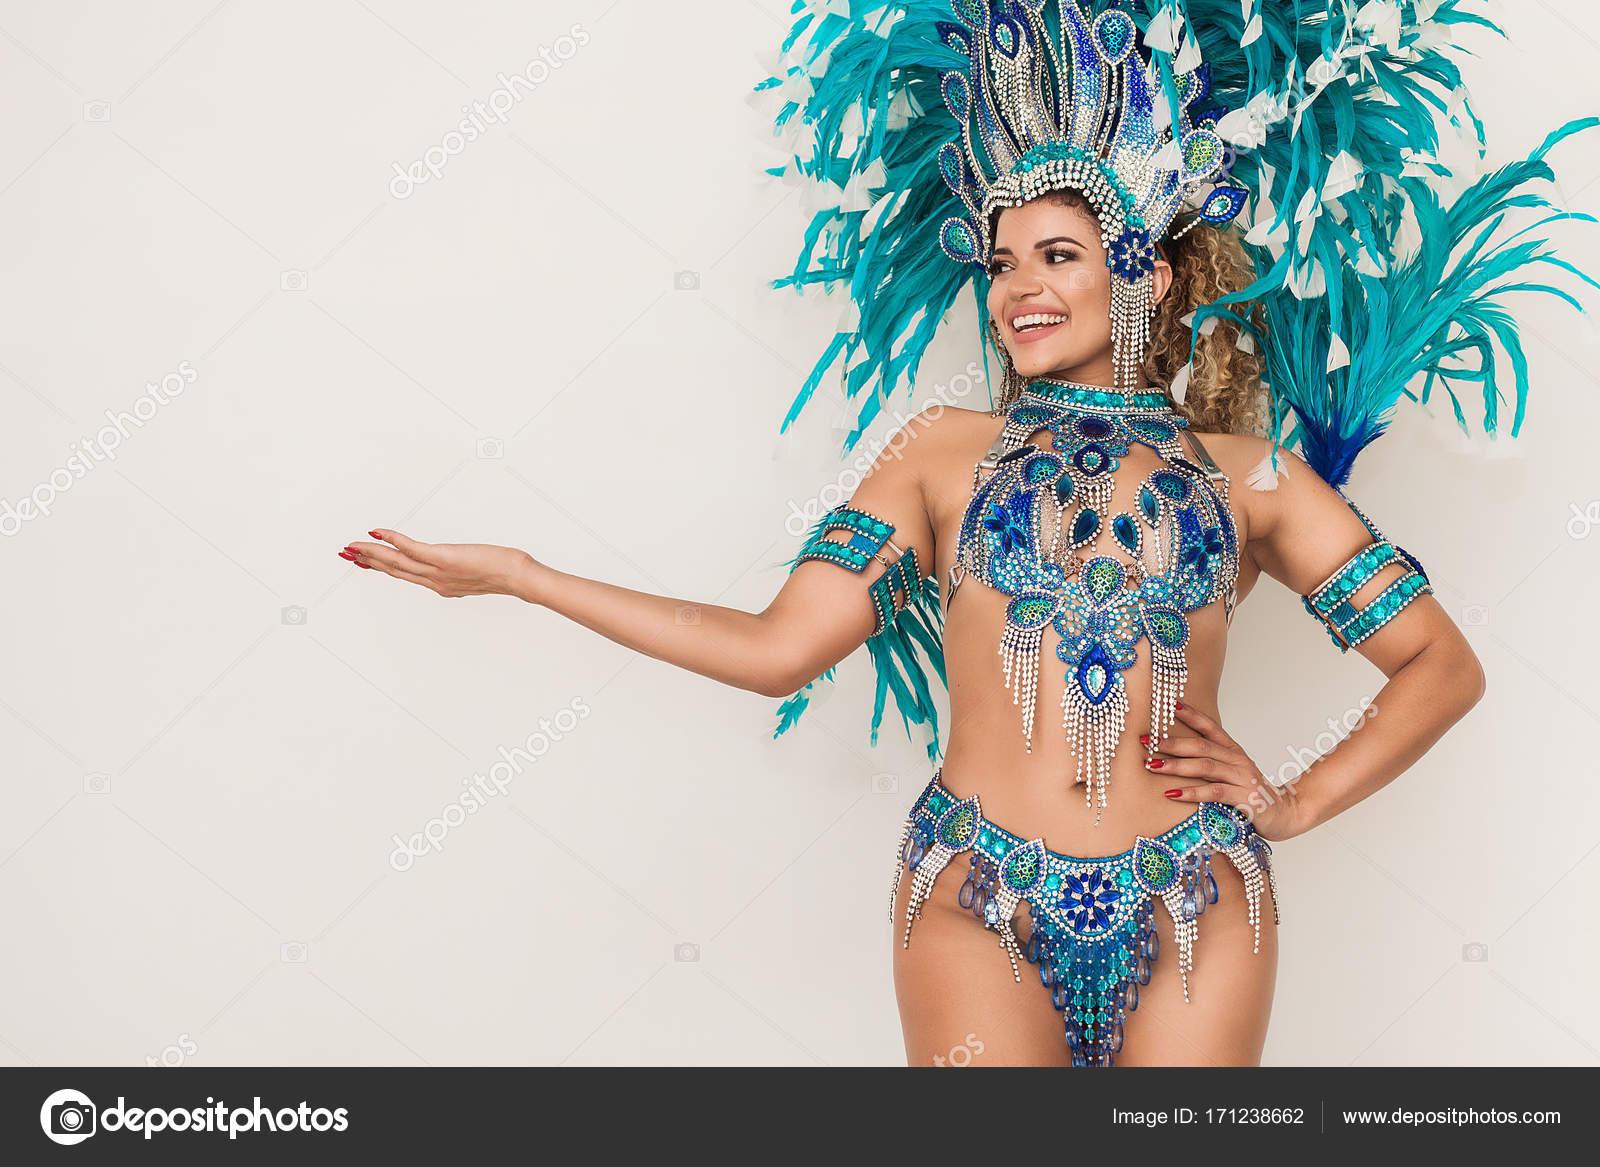 Сексуальная бразильская танцовщица